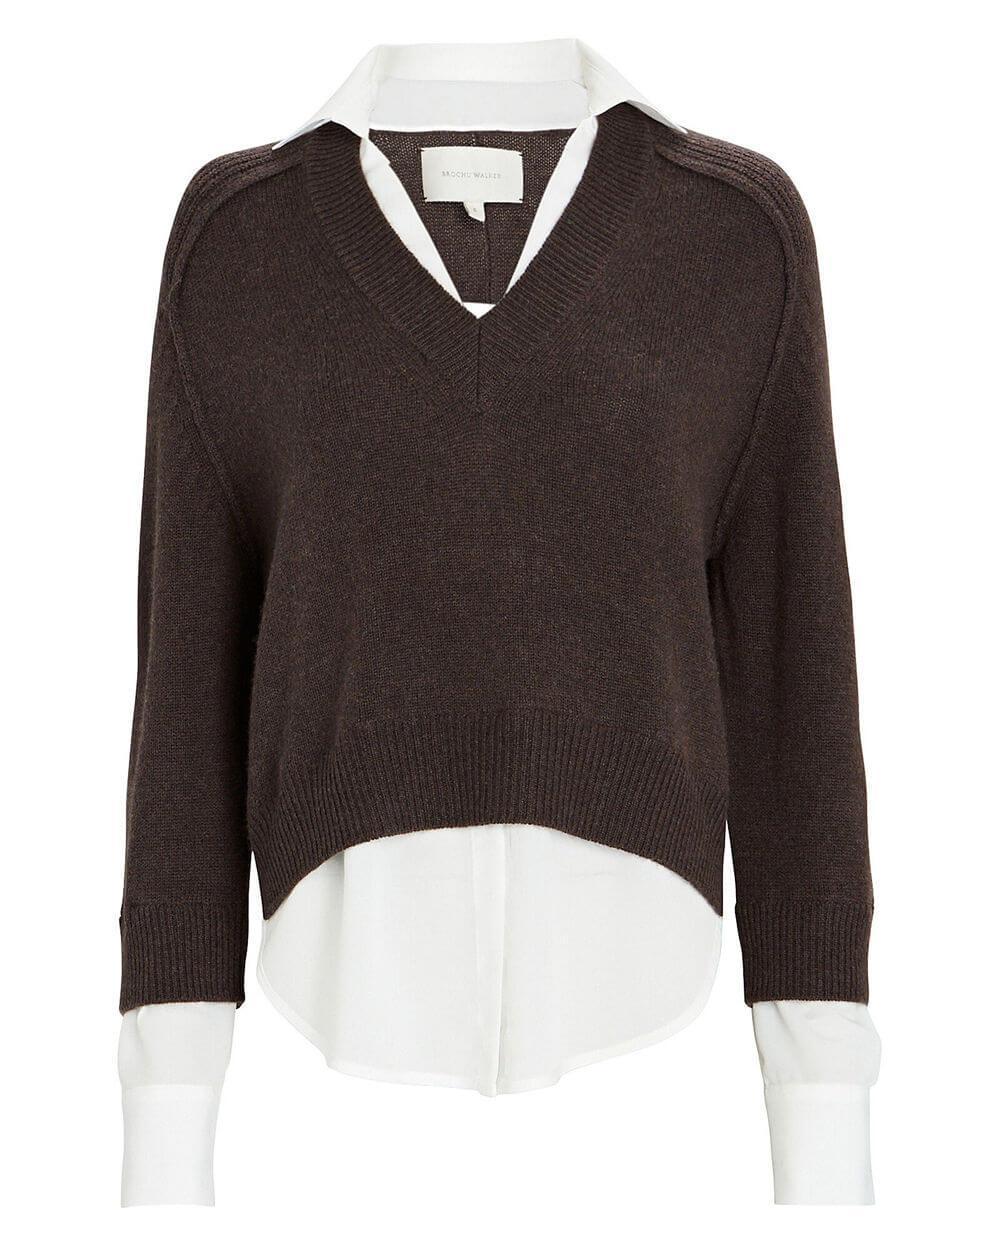 Alum V- Neck Layered Looker Sweater Item # JER3416